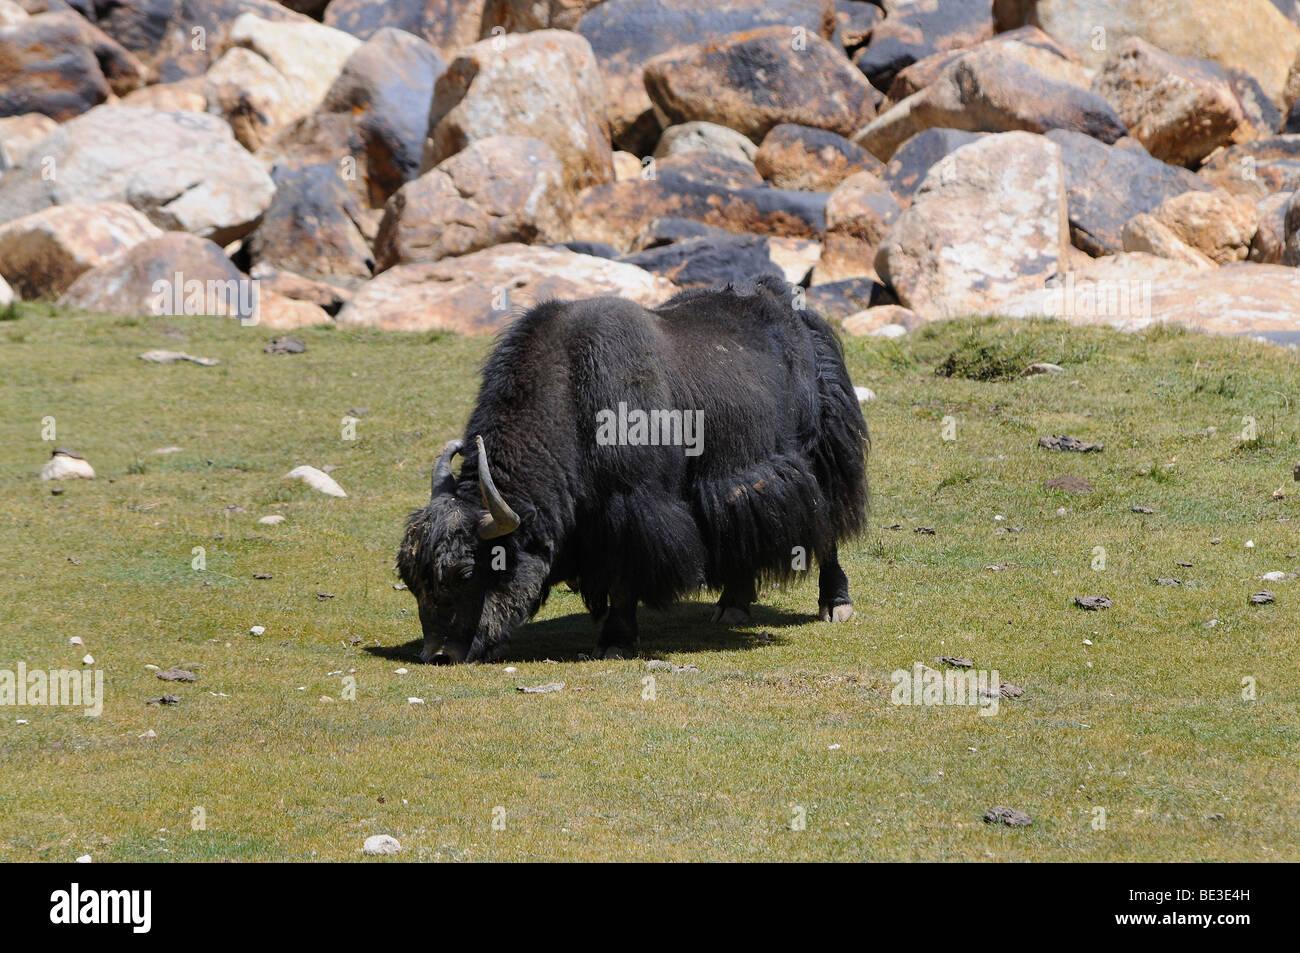 Yak (Bos mutus) 4500 AMSL, at the Khardongla pass, Leh, Ladakh, India, Himalayas, Asia - Stock Image